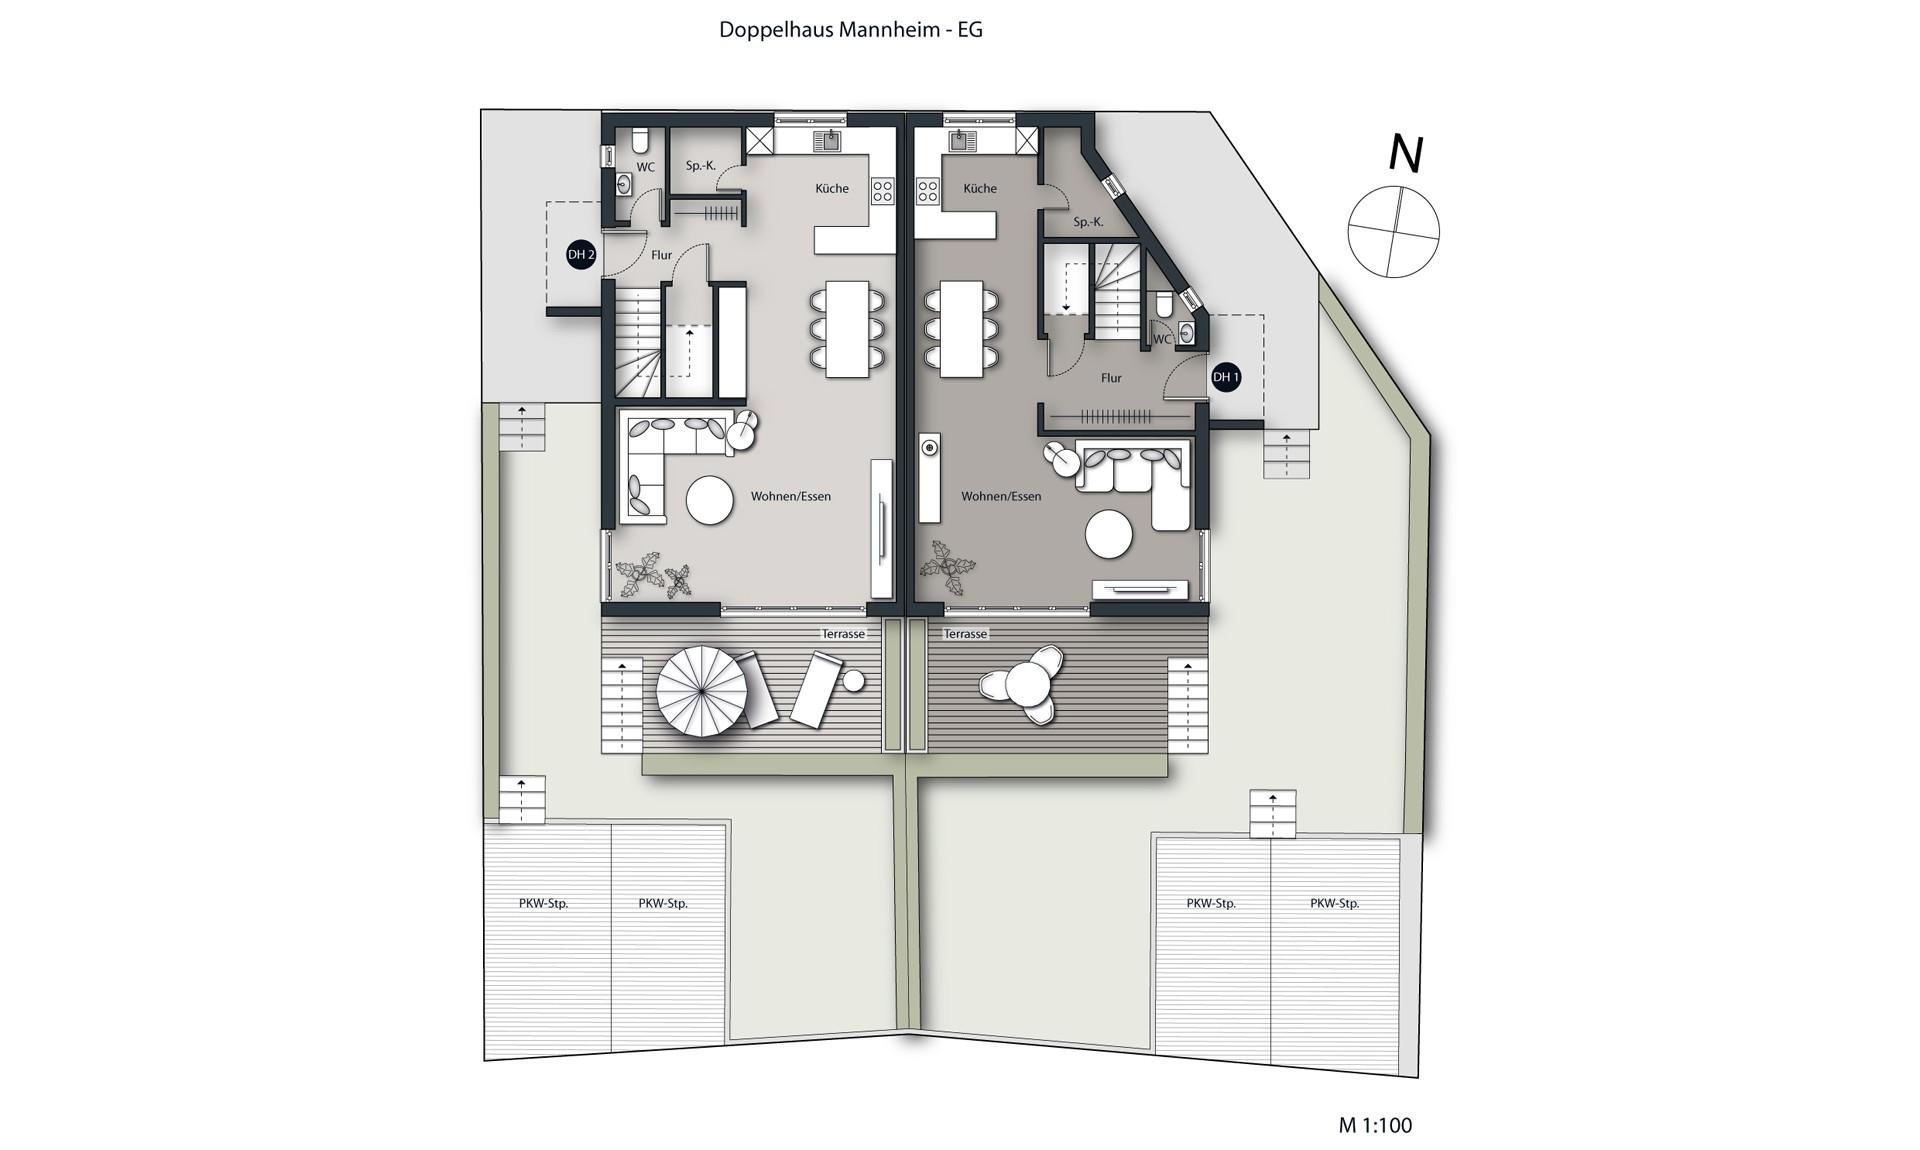 Visualisierung Doppelhaus Mannheim Grundriss EG